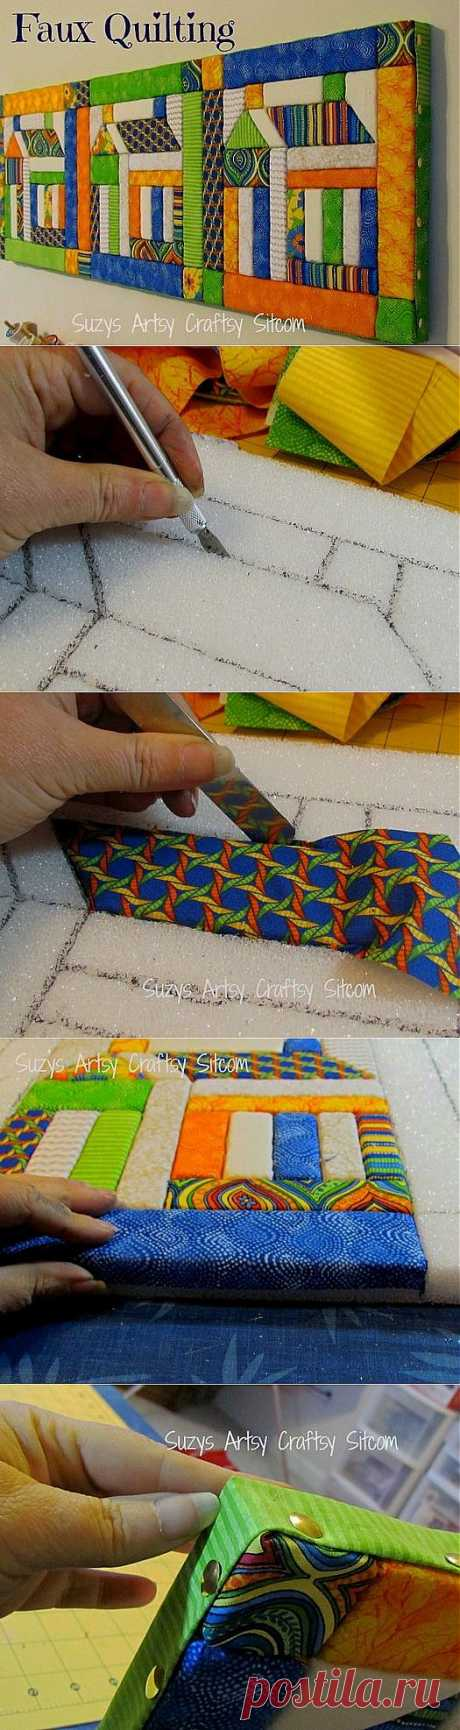 Поделки своими руками - Картина из ткани на пенопласте